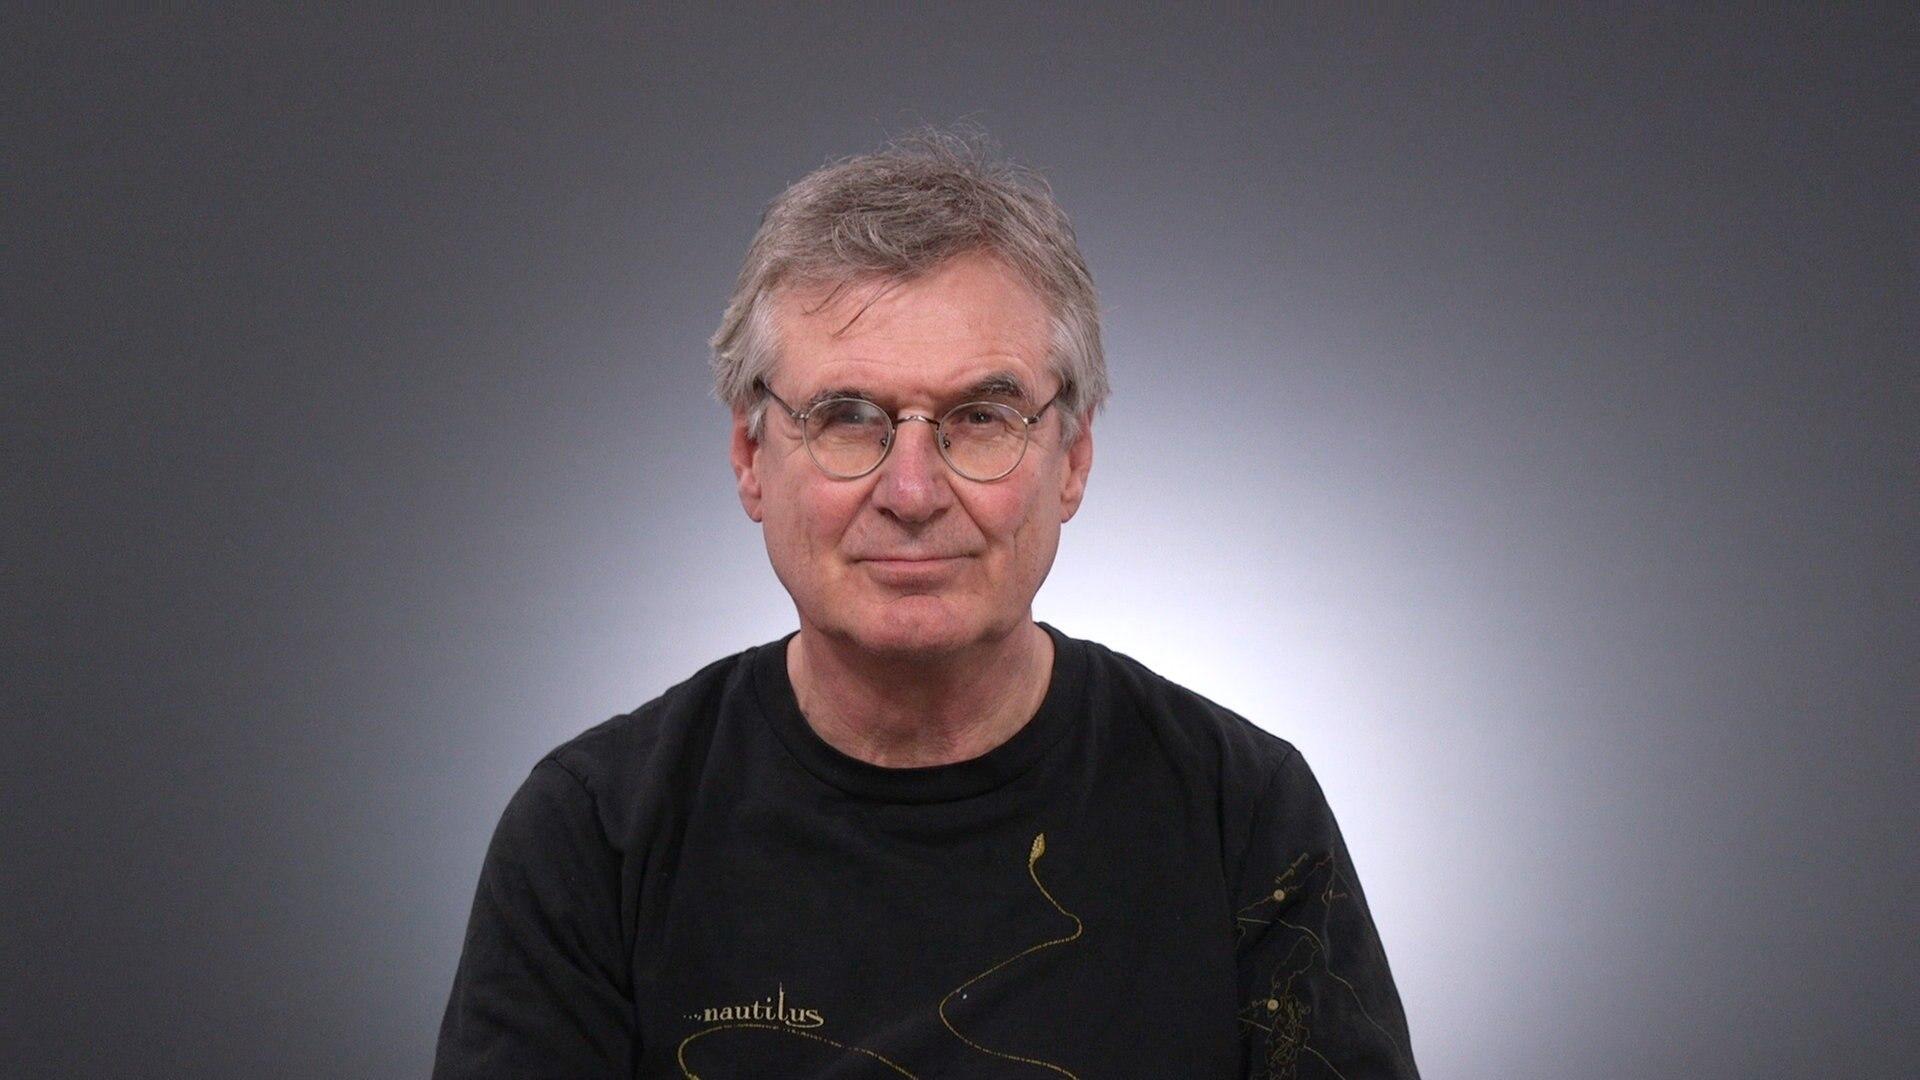 Norbert Hackbusch, DIE LINKE